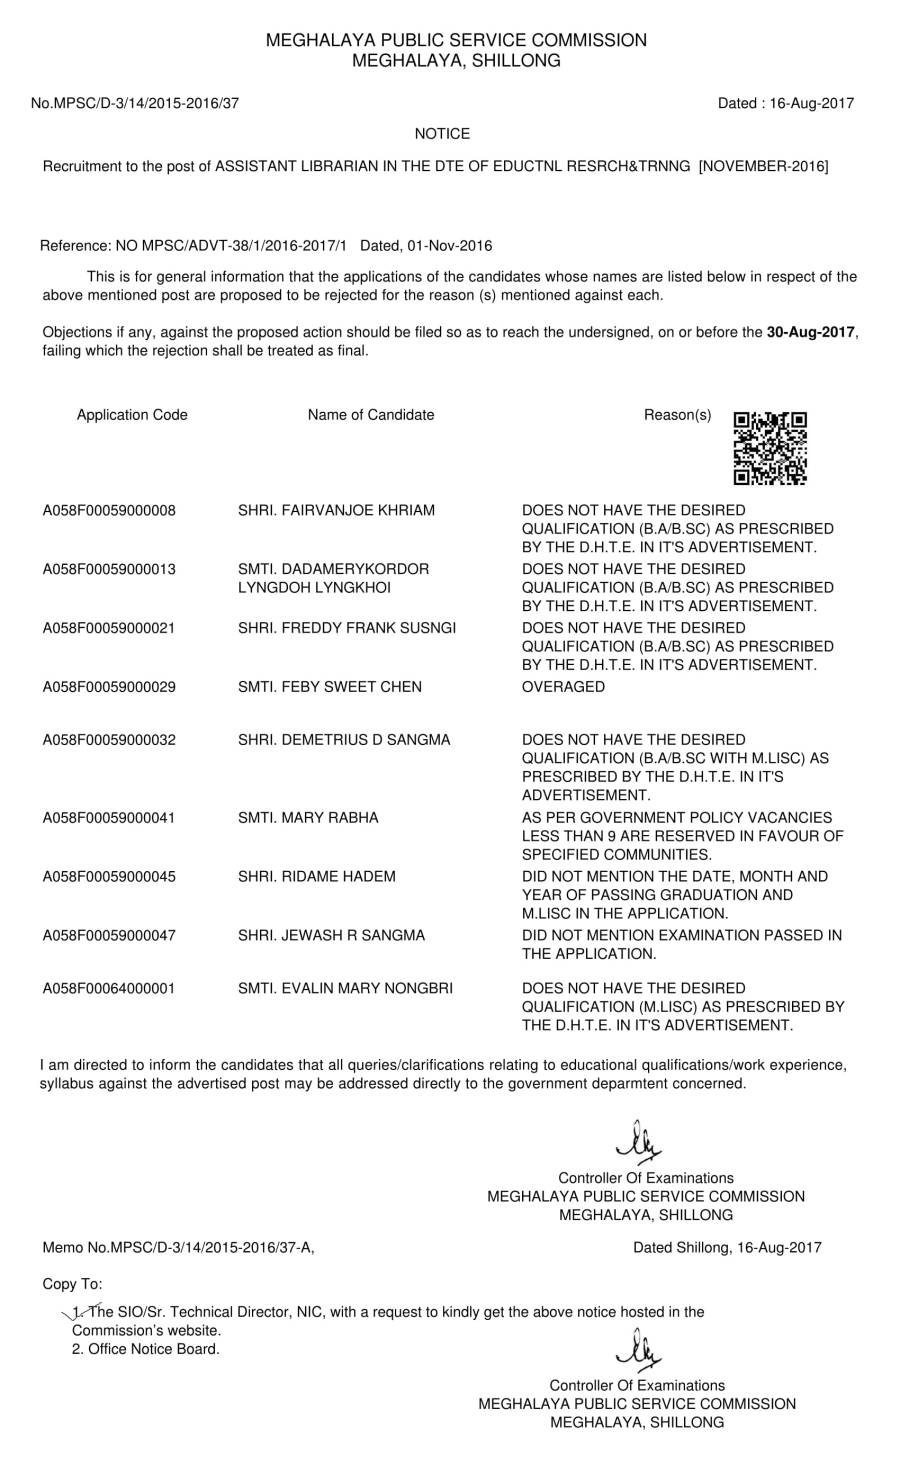 NOTICE 22 AUG2017g-1.jpg